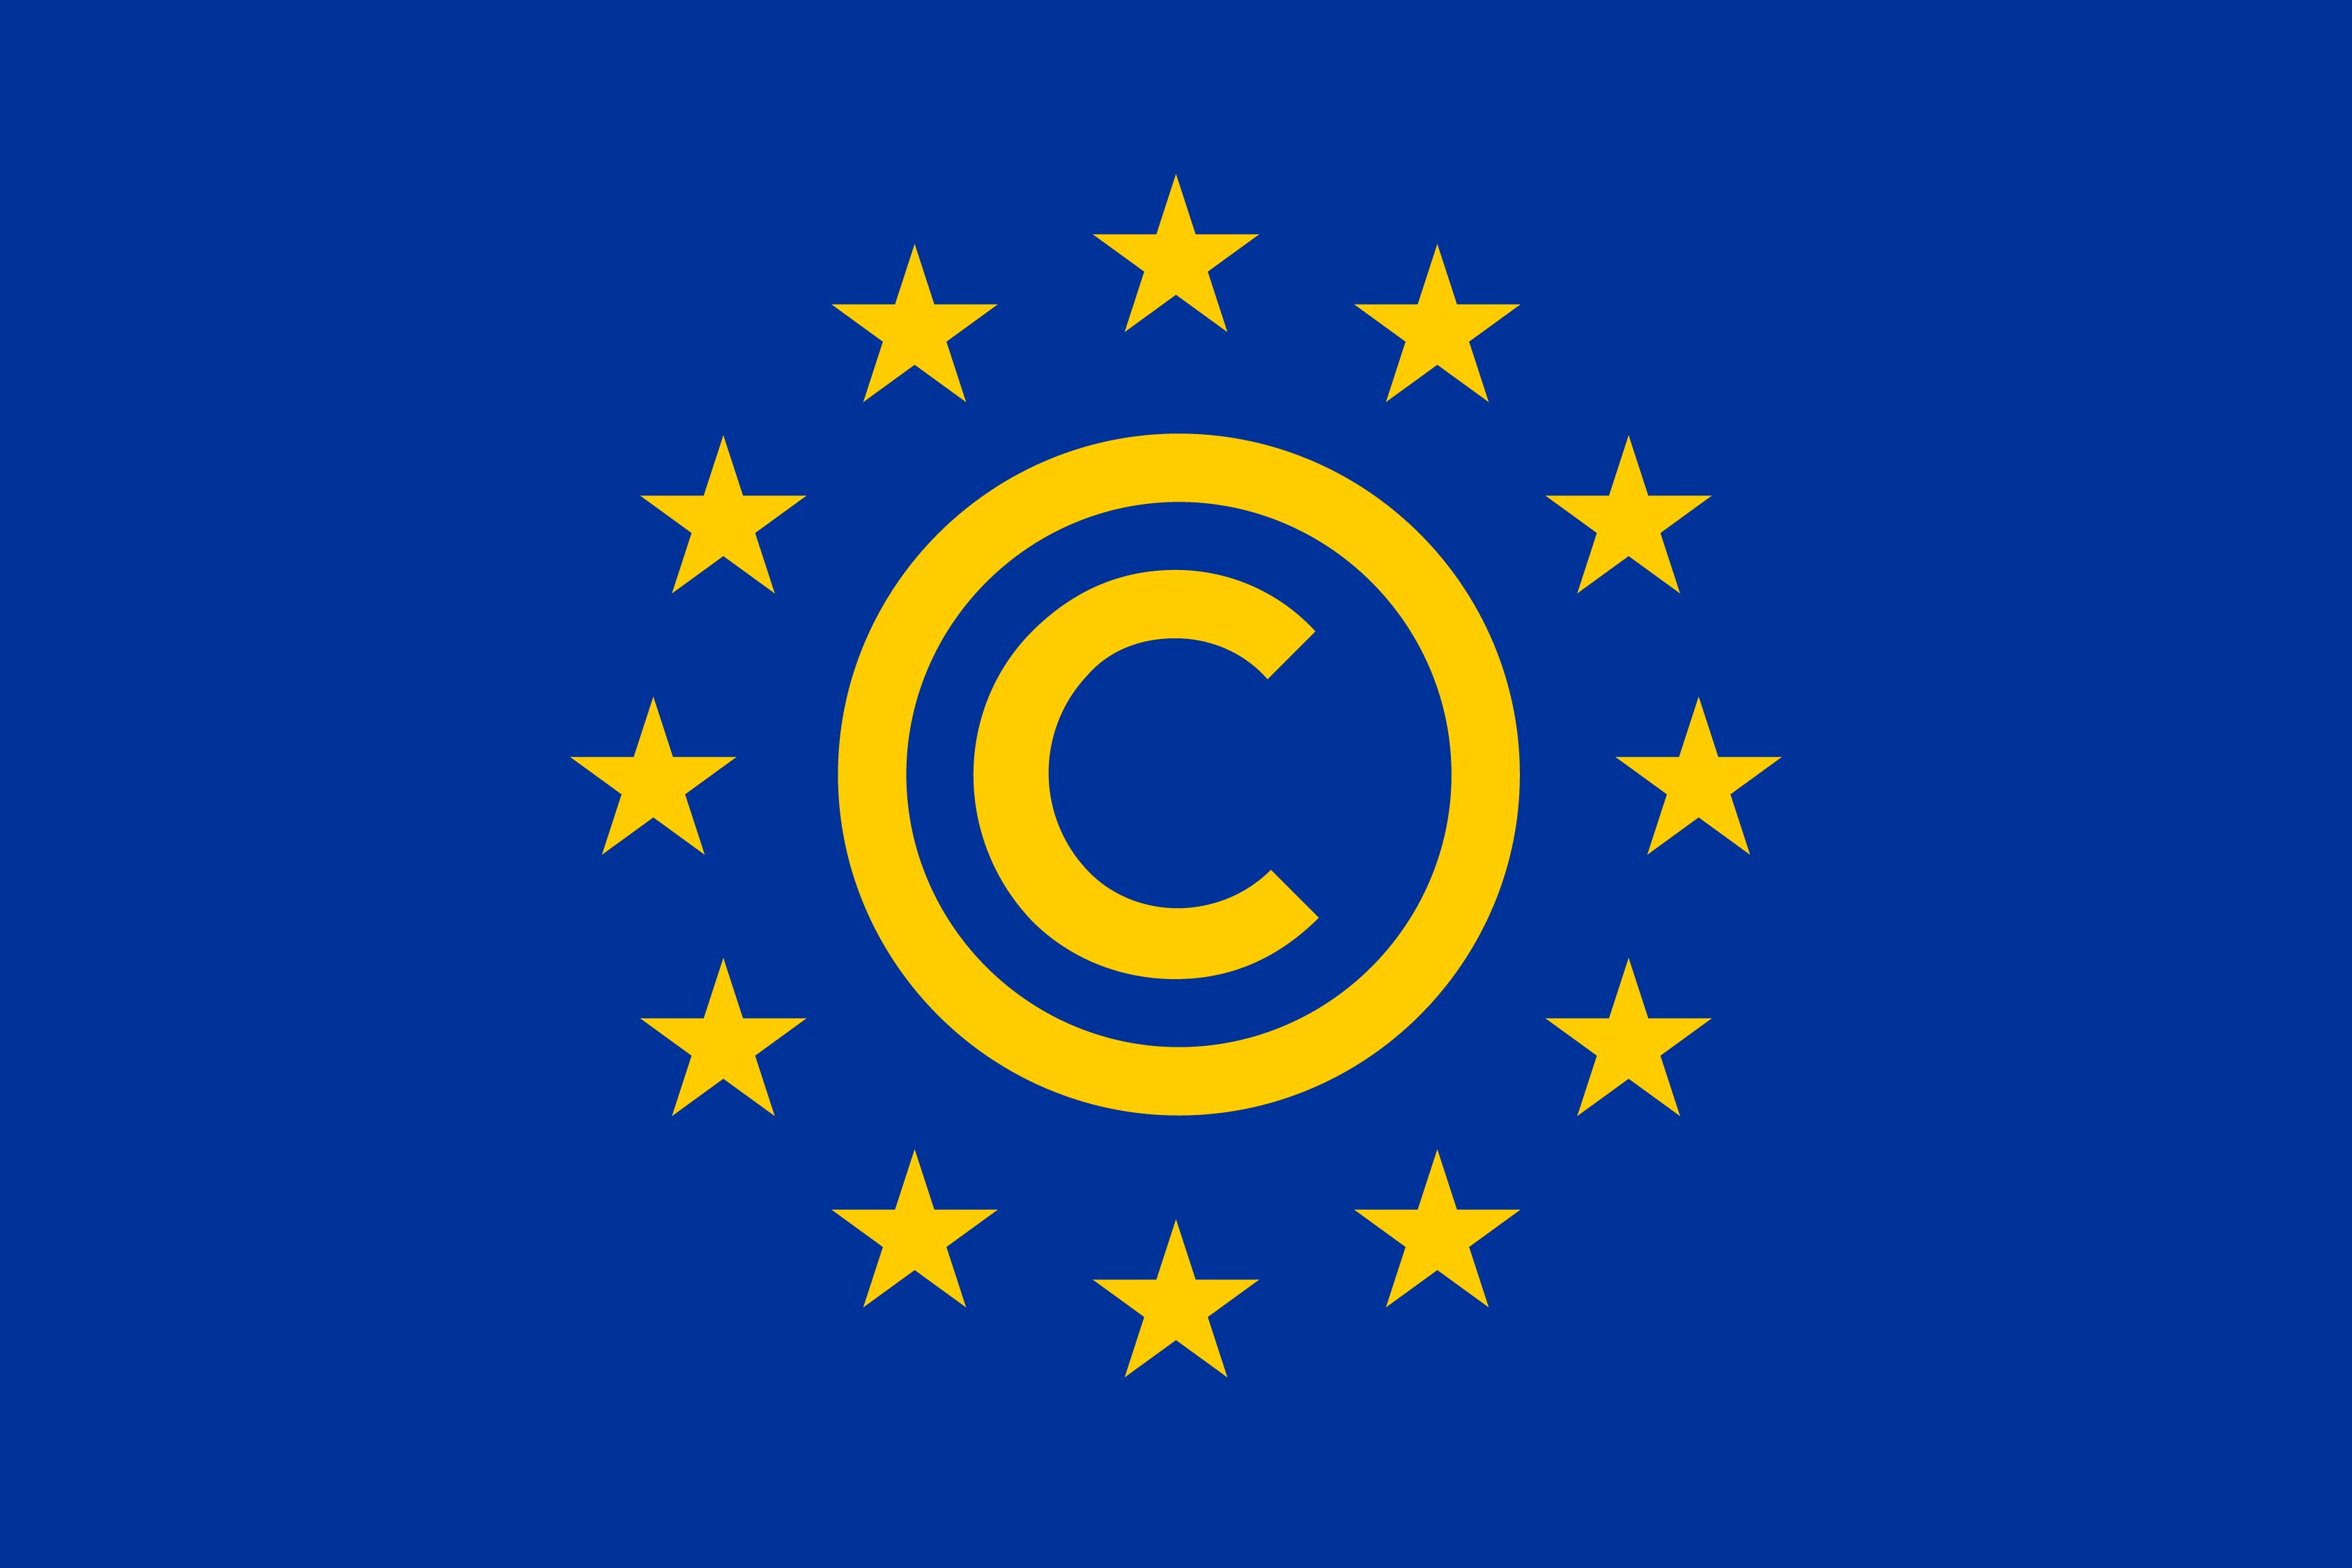 EUROPE WRESTLES BIG TECH TO THE MAT